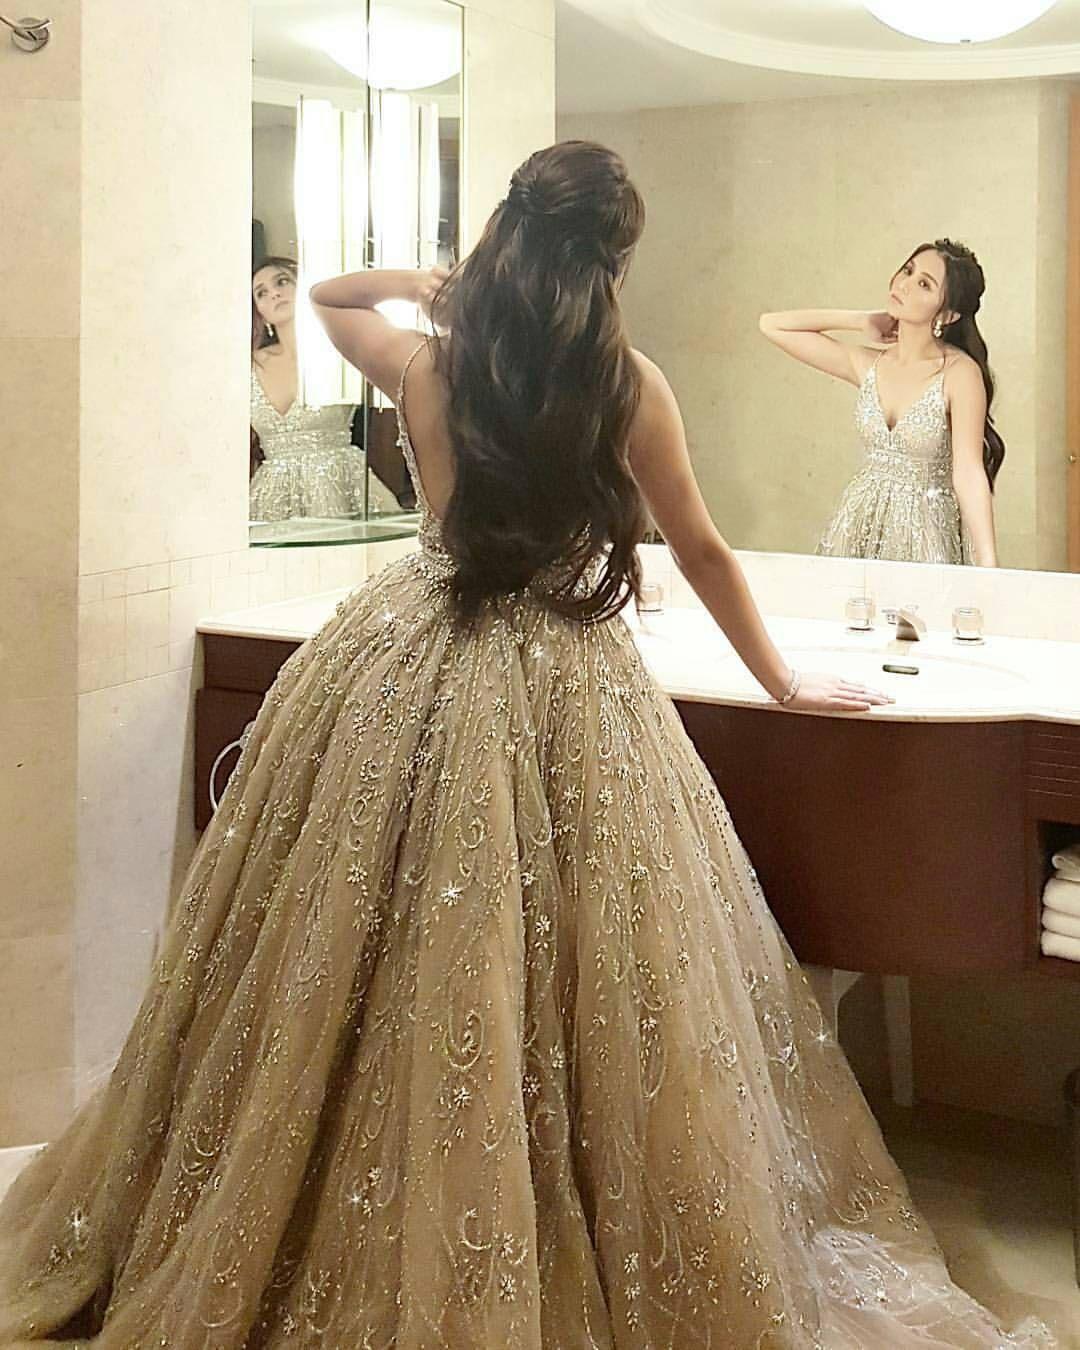 Pin By Hannah Sherlock On Soiree Backless Lace Wedding Dress Wedding Dress Champagne Dresses